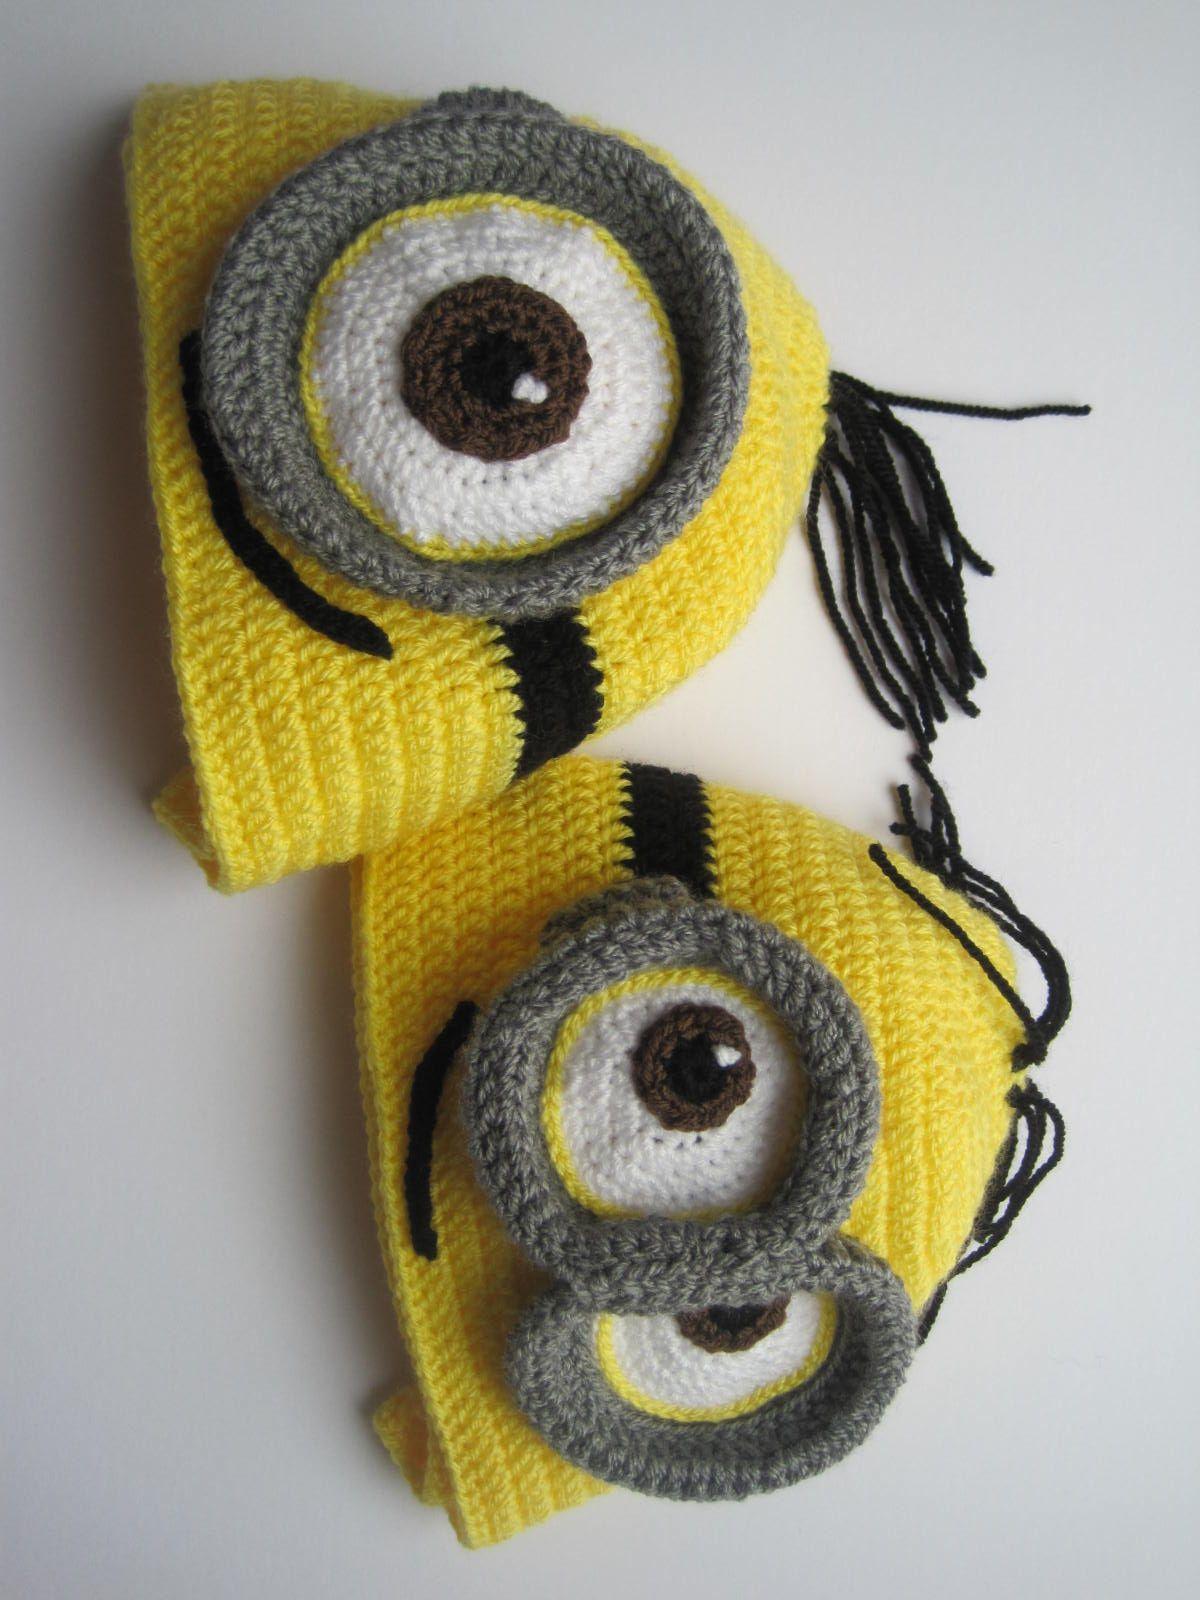 Minion inspired crochet hats little cousins crochet hats minion inspired crochet hats little cousins bankloansurffo Choice Image